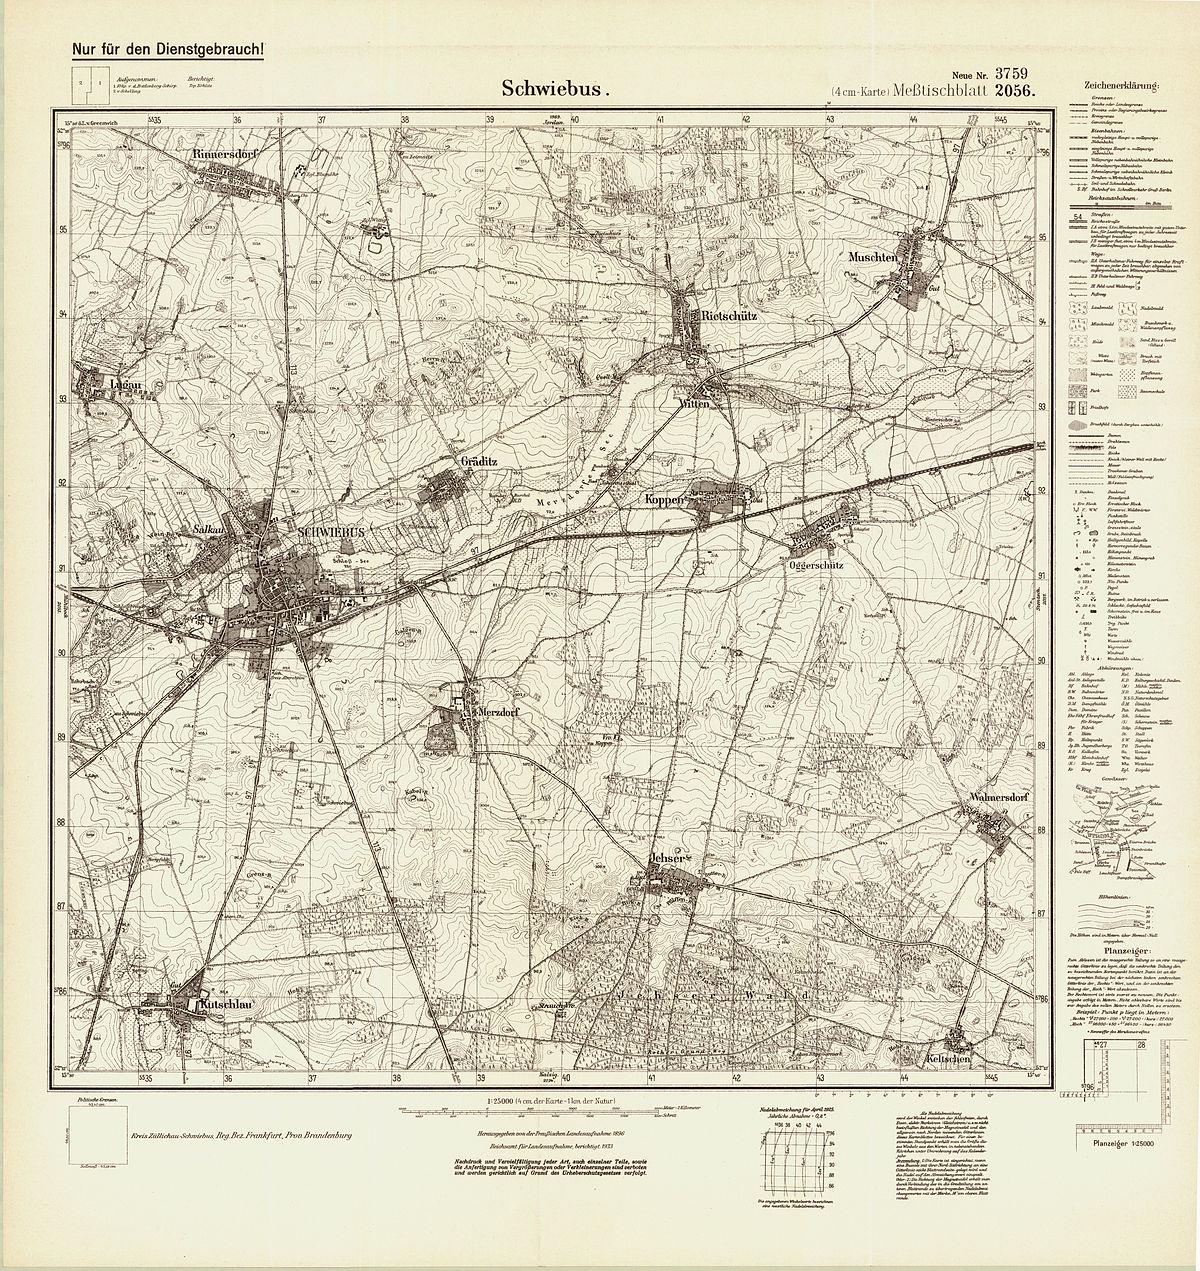 Topographische Karte Nrw.Messtischblatt Wikipedia